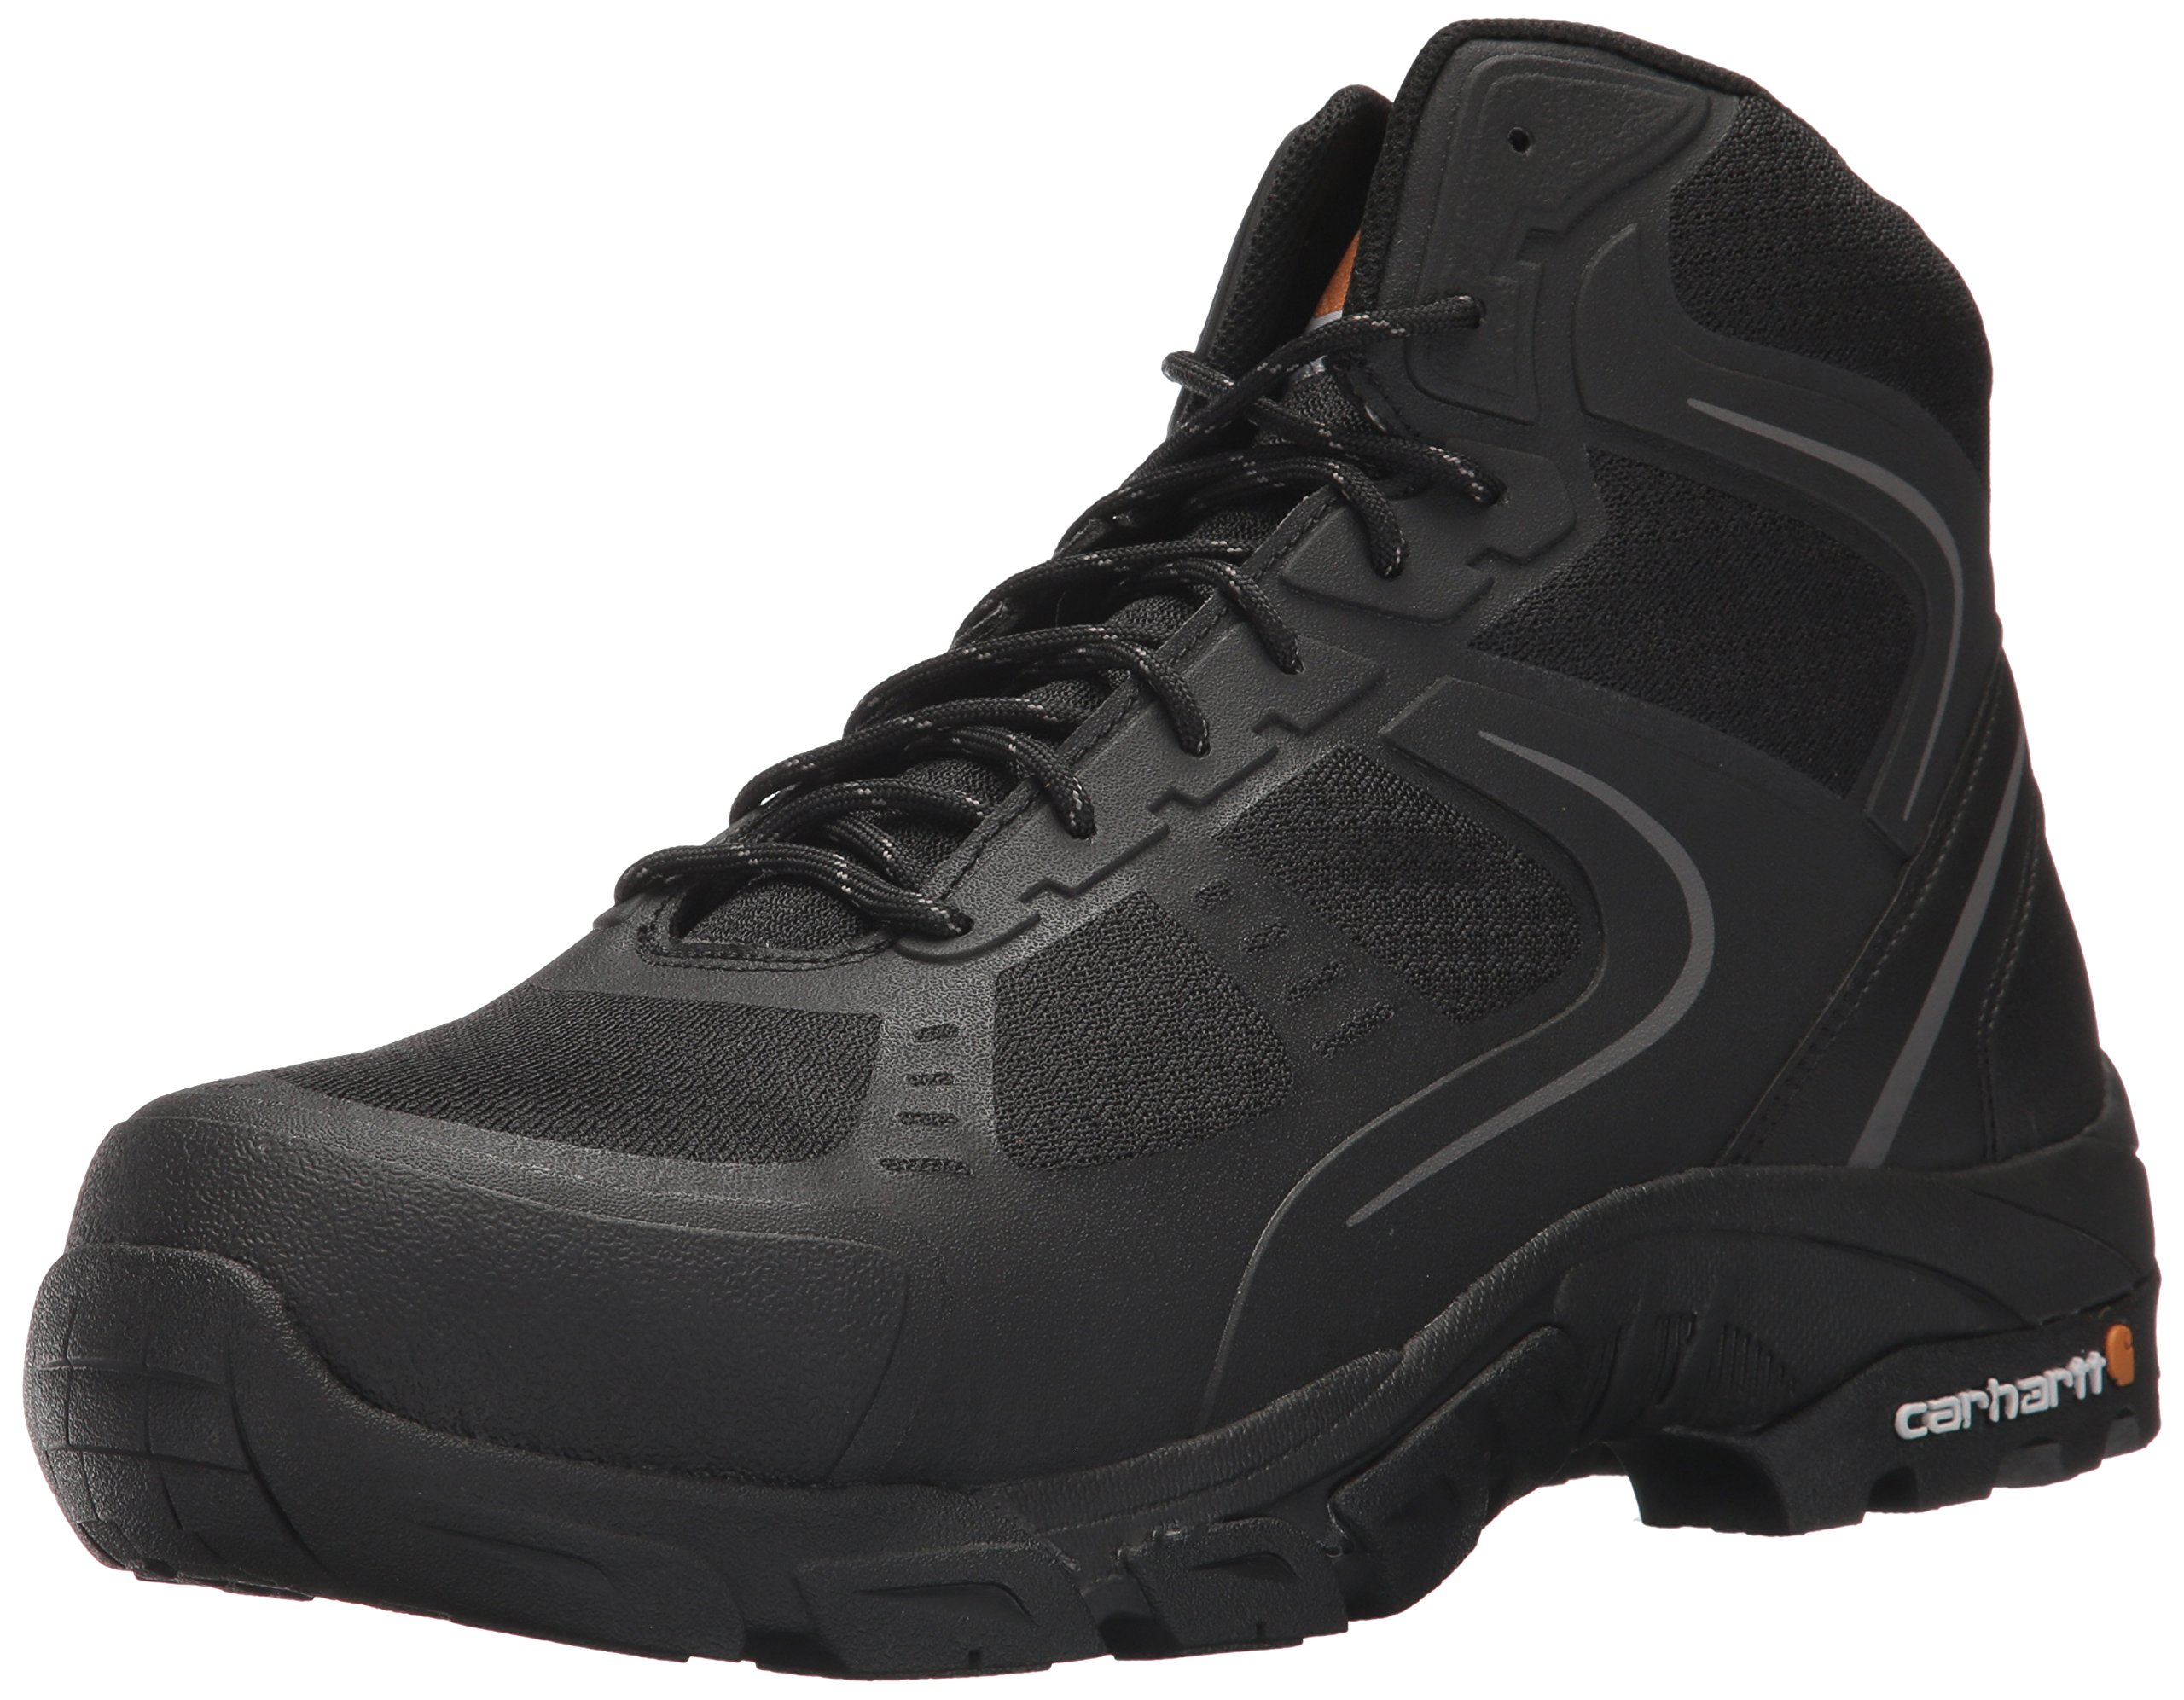 Carhartt Men's CMH4251 6'' Lightweight FastDry Technology Steel Toe Hiker Boot, Black Mesh and Synthetic, 13 M US